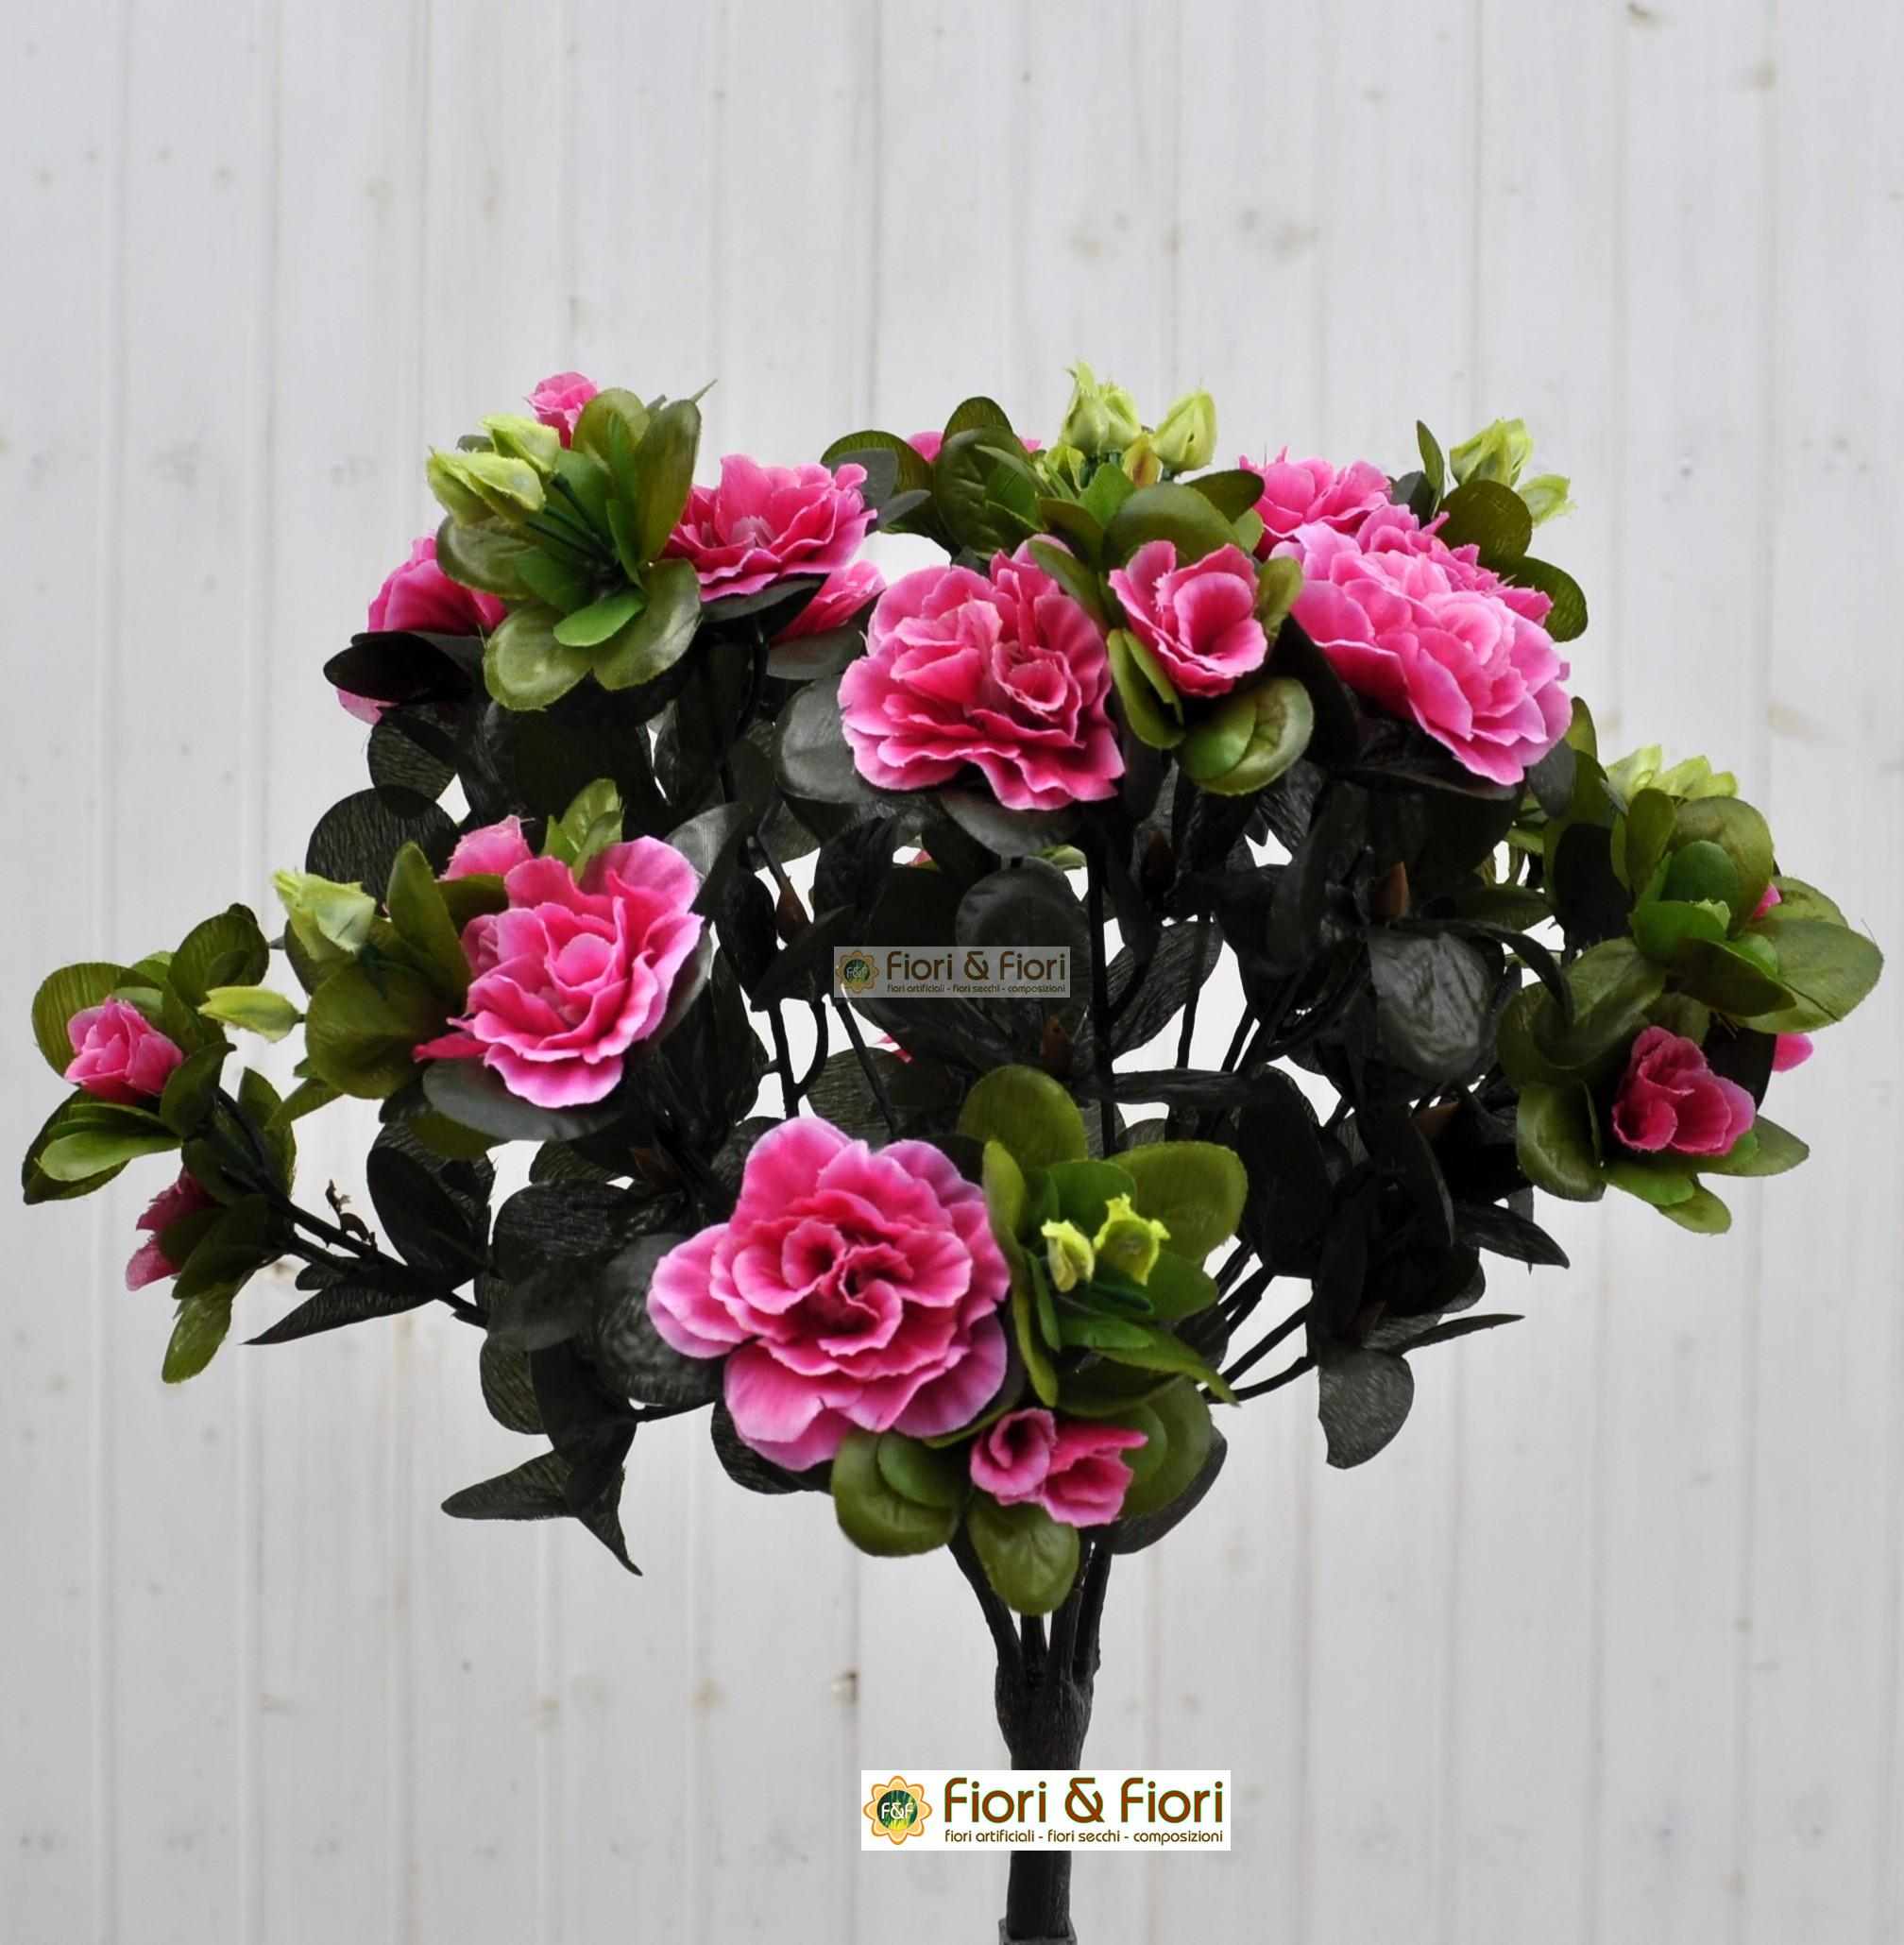 Azalea artificiale fucsia adatta sia da interno che esterno - Azalea pianta da interno o esterno ...